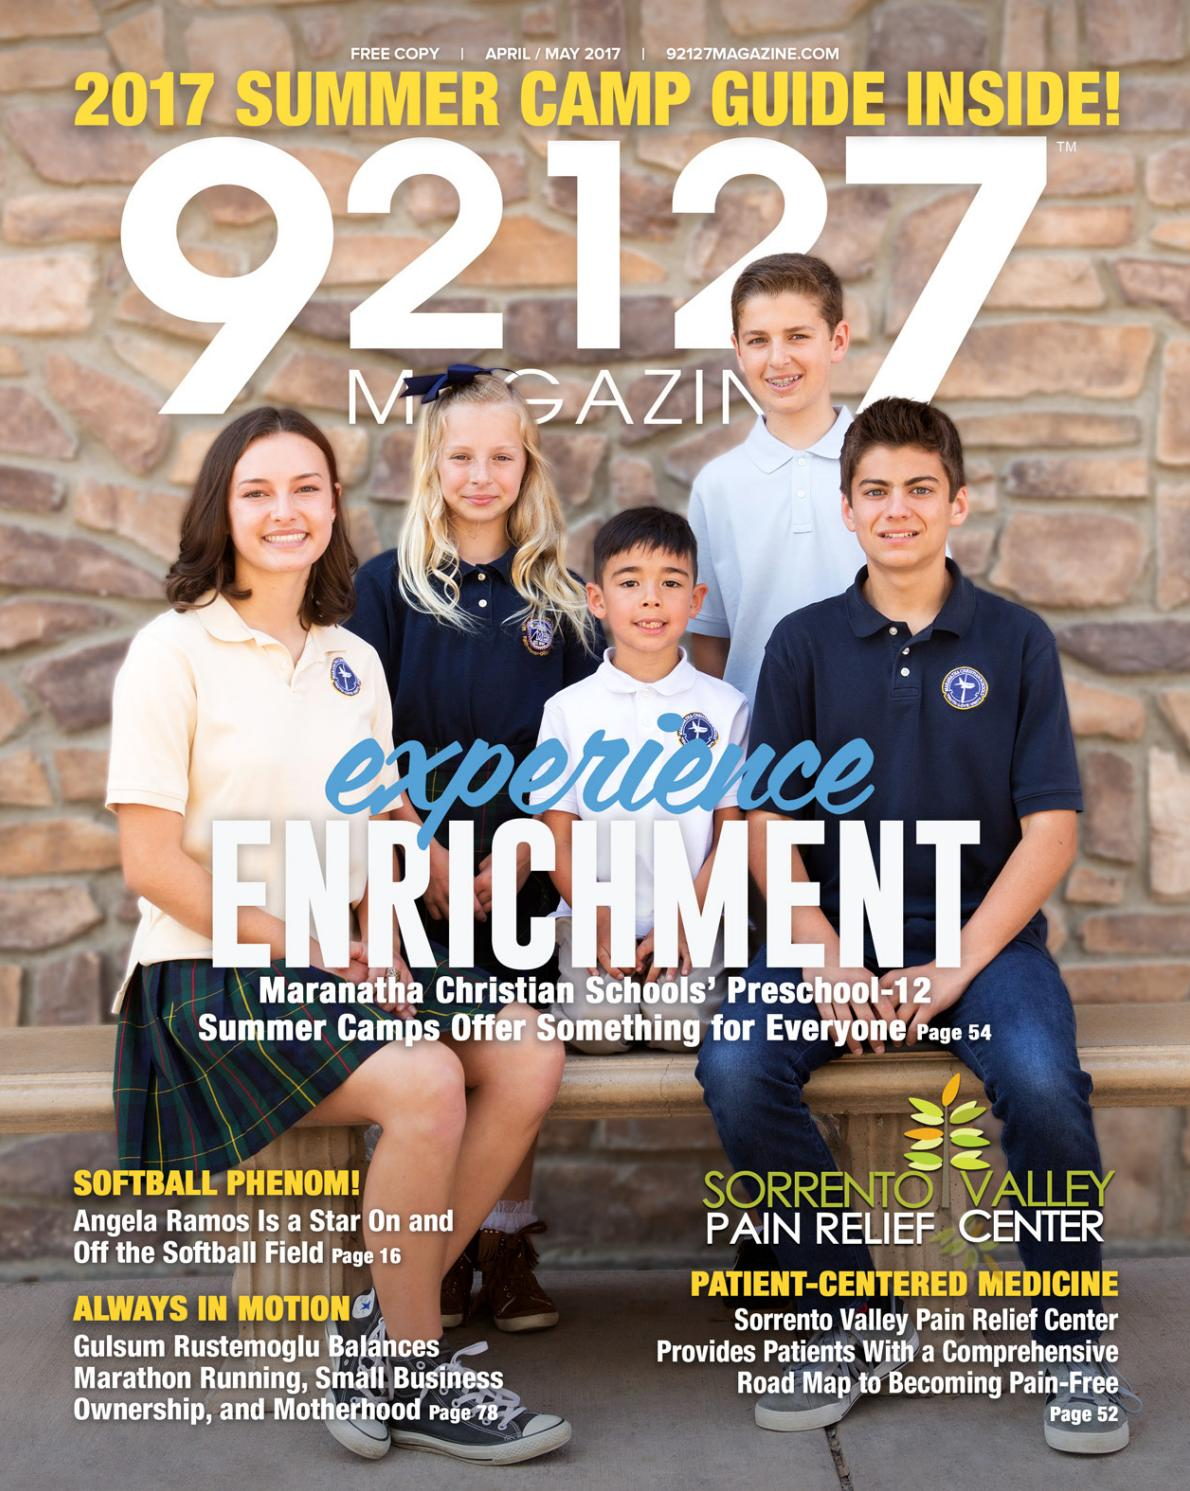 92127 magazine aprilmay 2017 by zcode magazines susco media issuu fandeluxe Choice Image